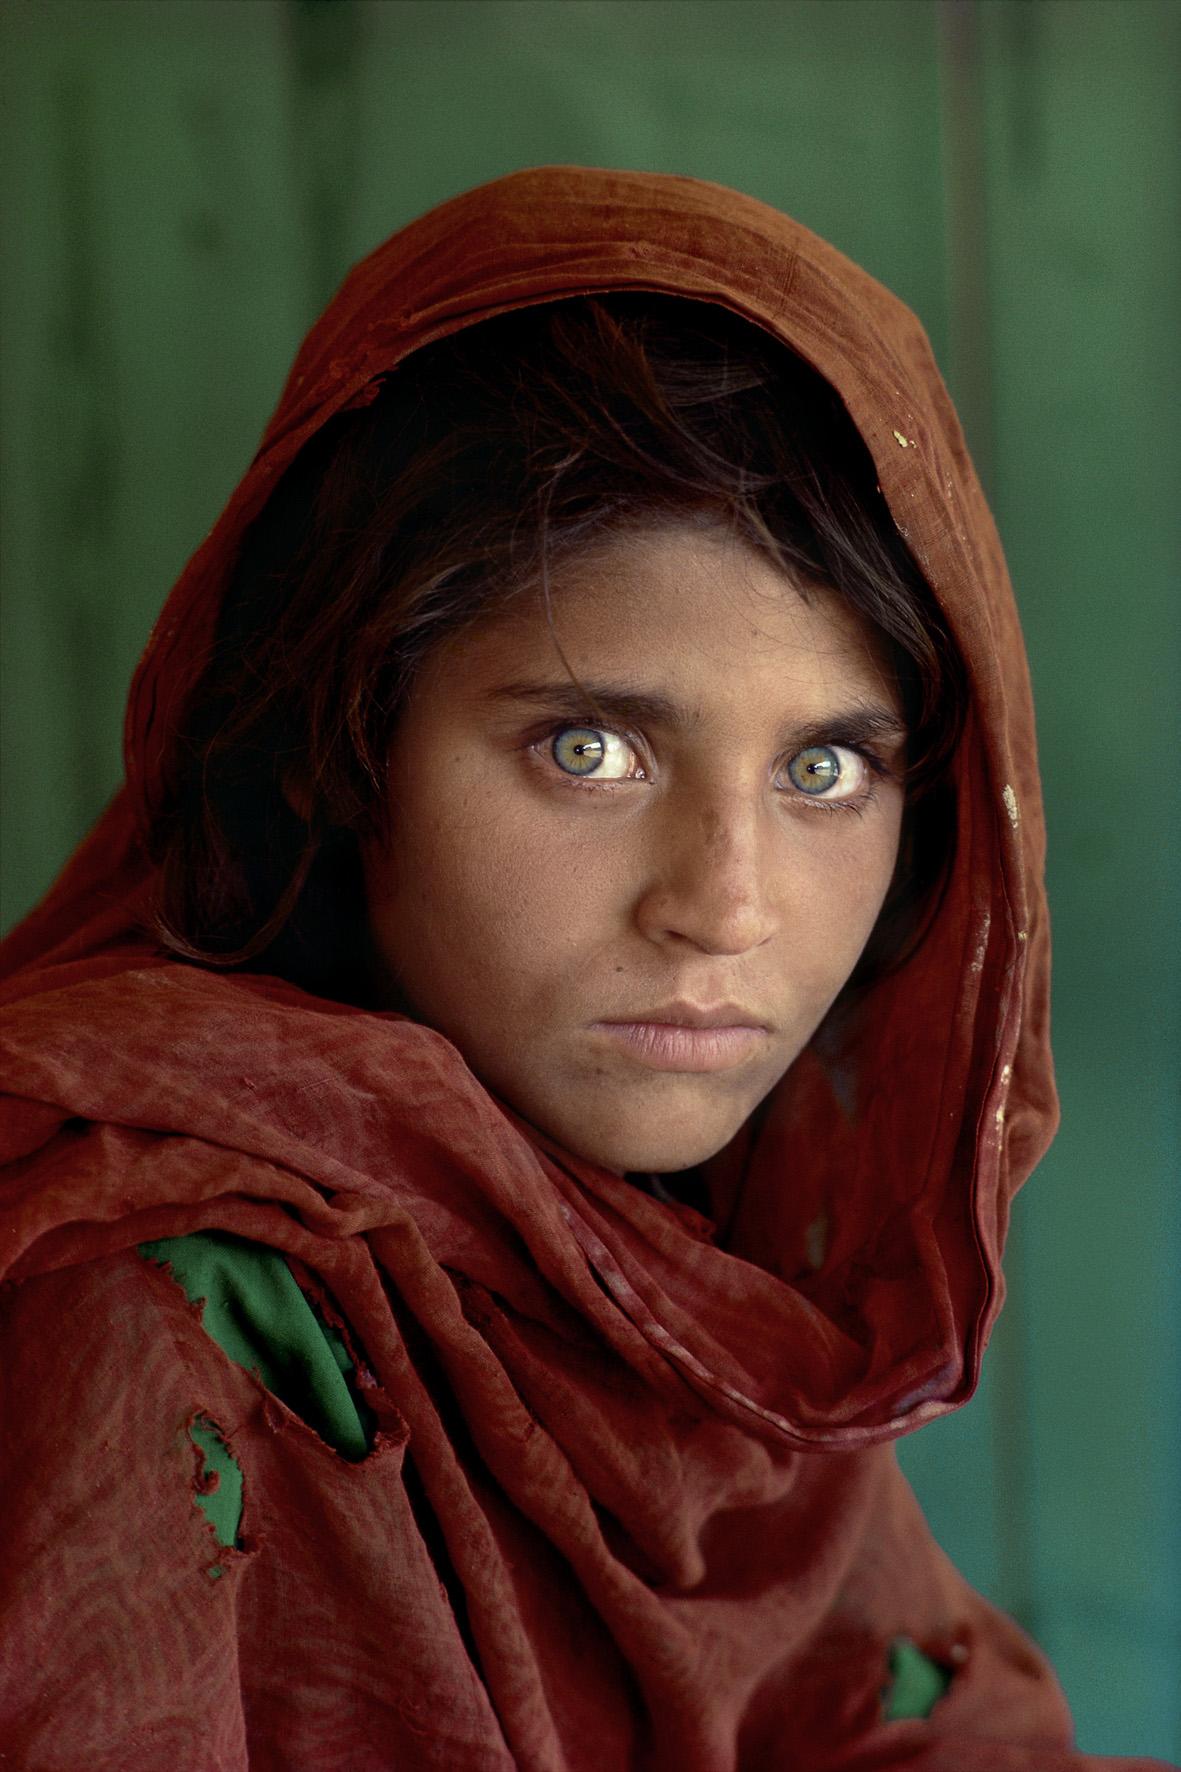 Sharbat Gula, ragazza afgana al campo profughi di Nasir Bagh vicino a Peshawar, Pakistan, 1984